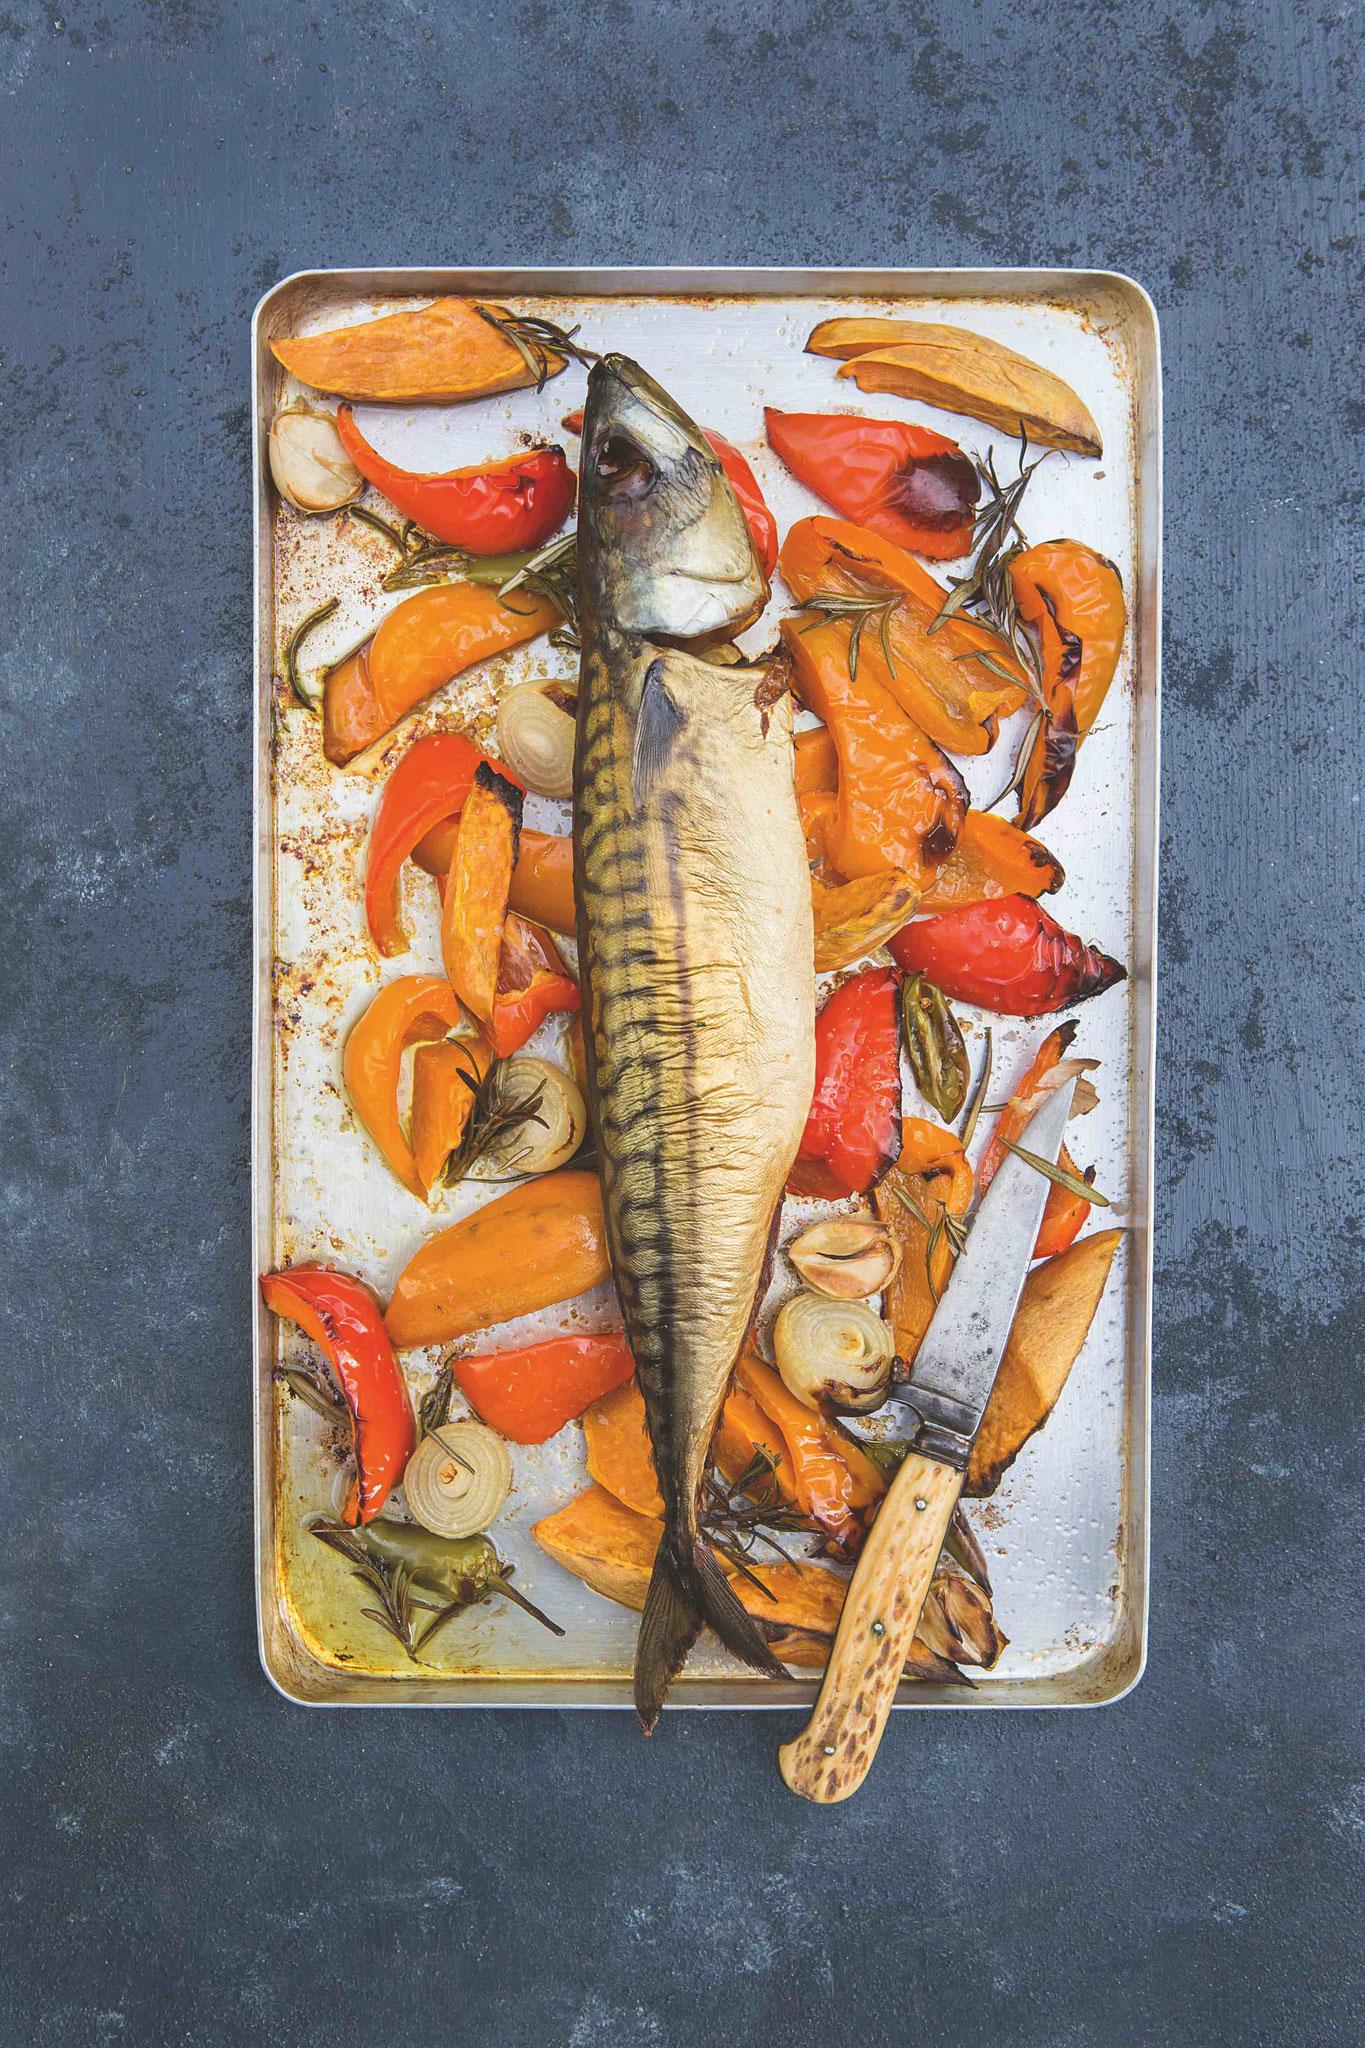 Makrele geräuchert*